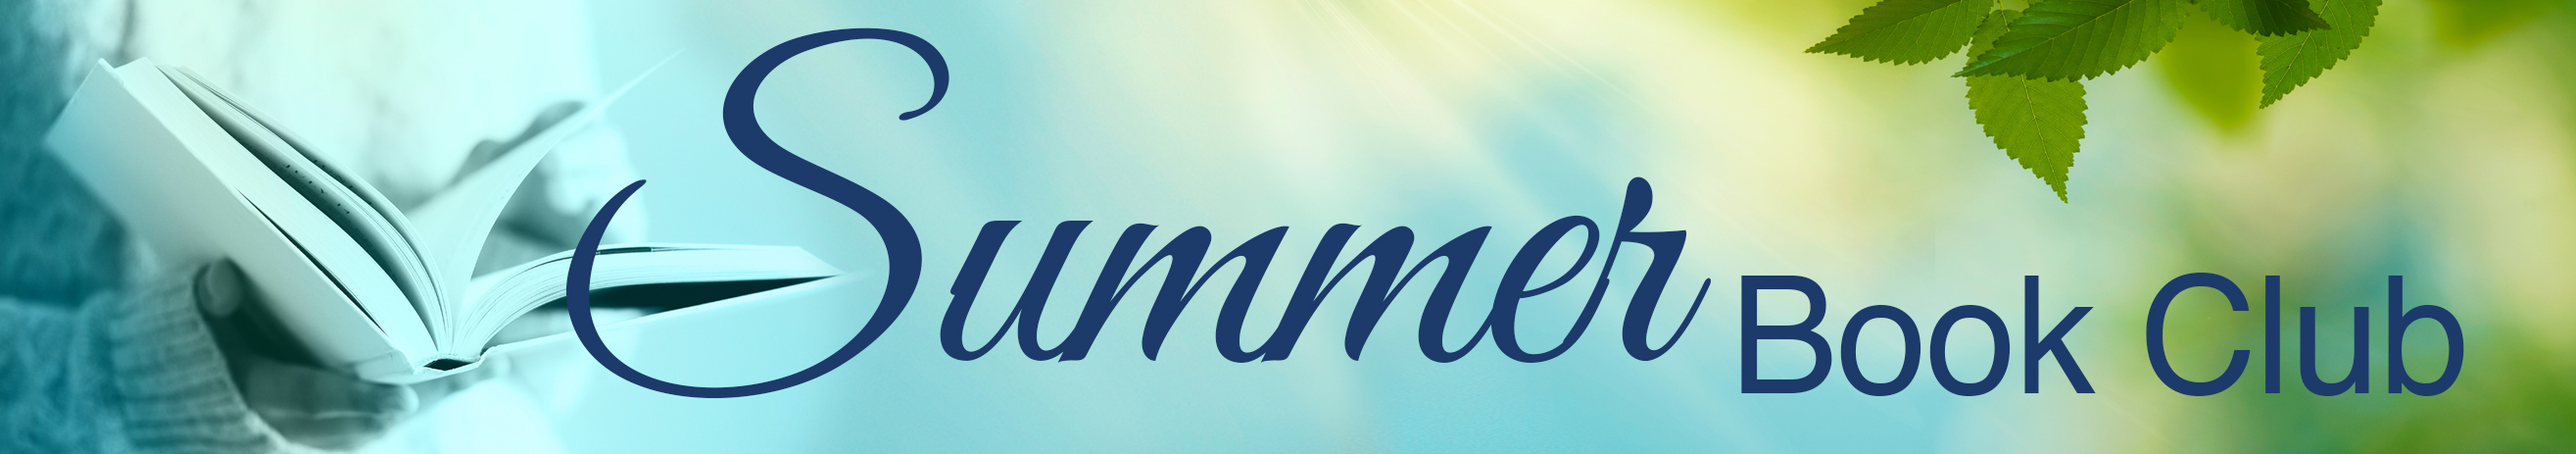 ACSI - Purposeful Design Publications  Summer Book Club